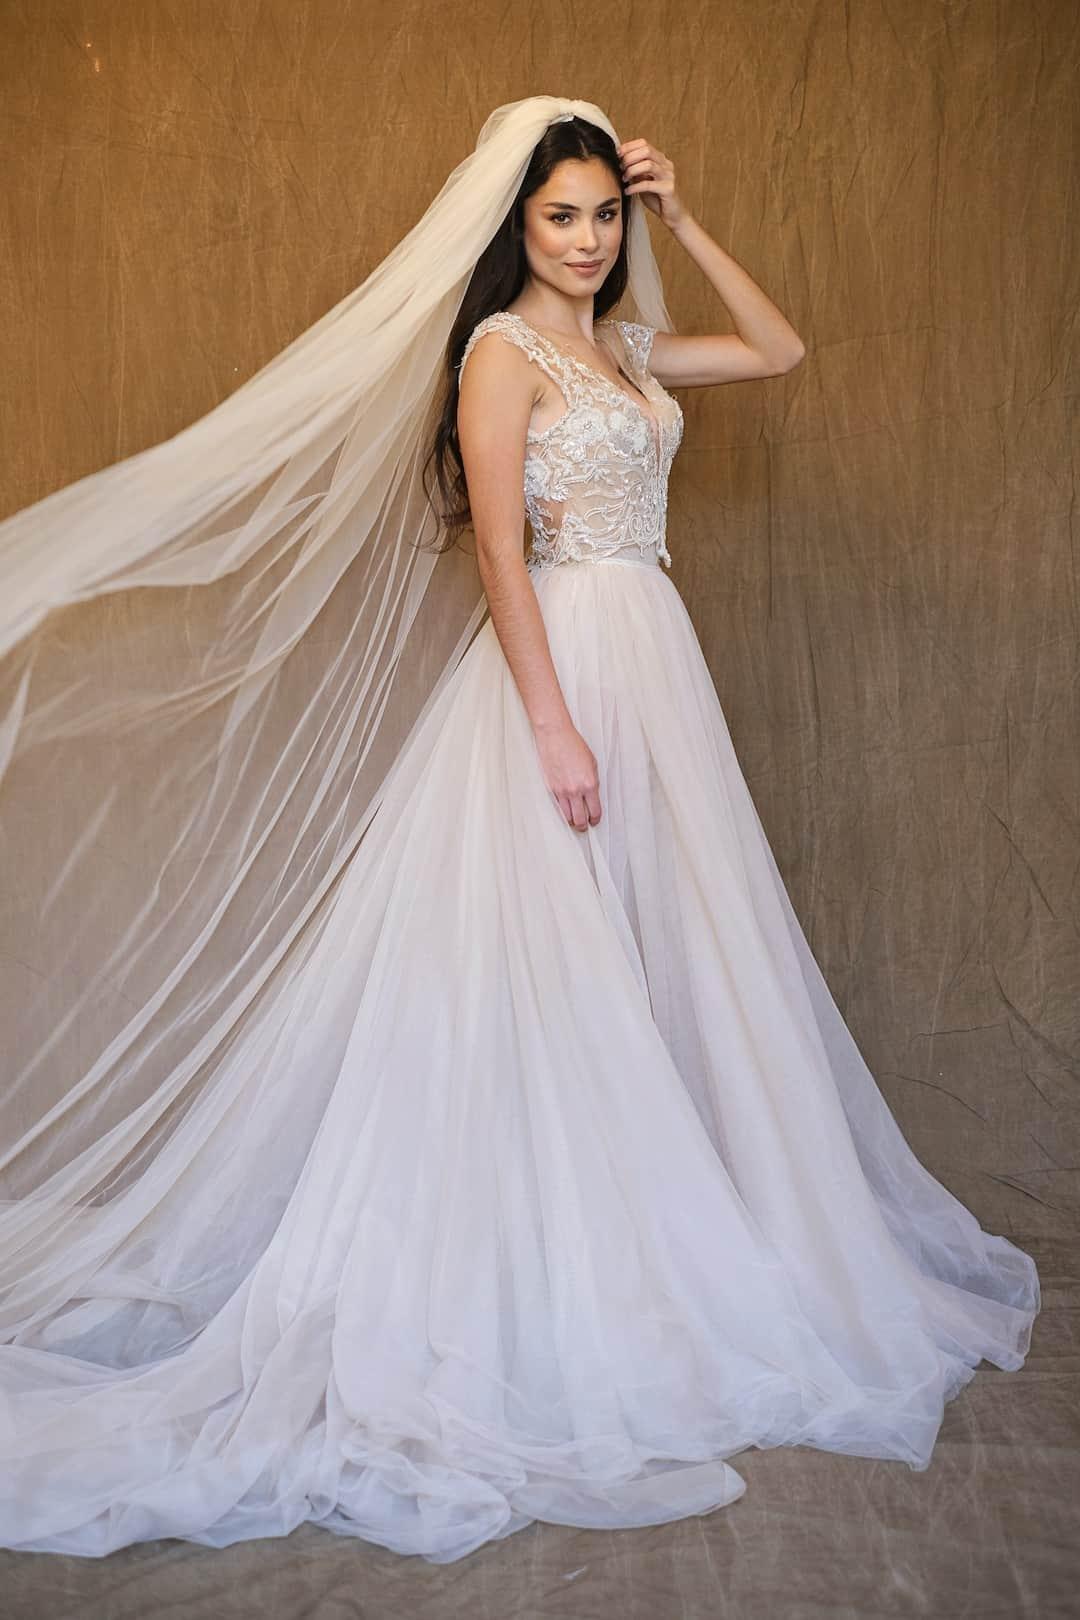 Haute Couture Wedding Dresses - Galia Lahav - Gala 607 - front